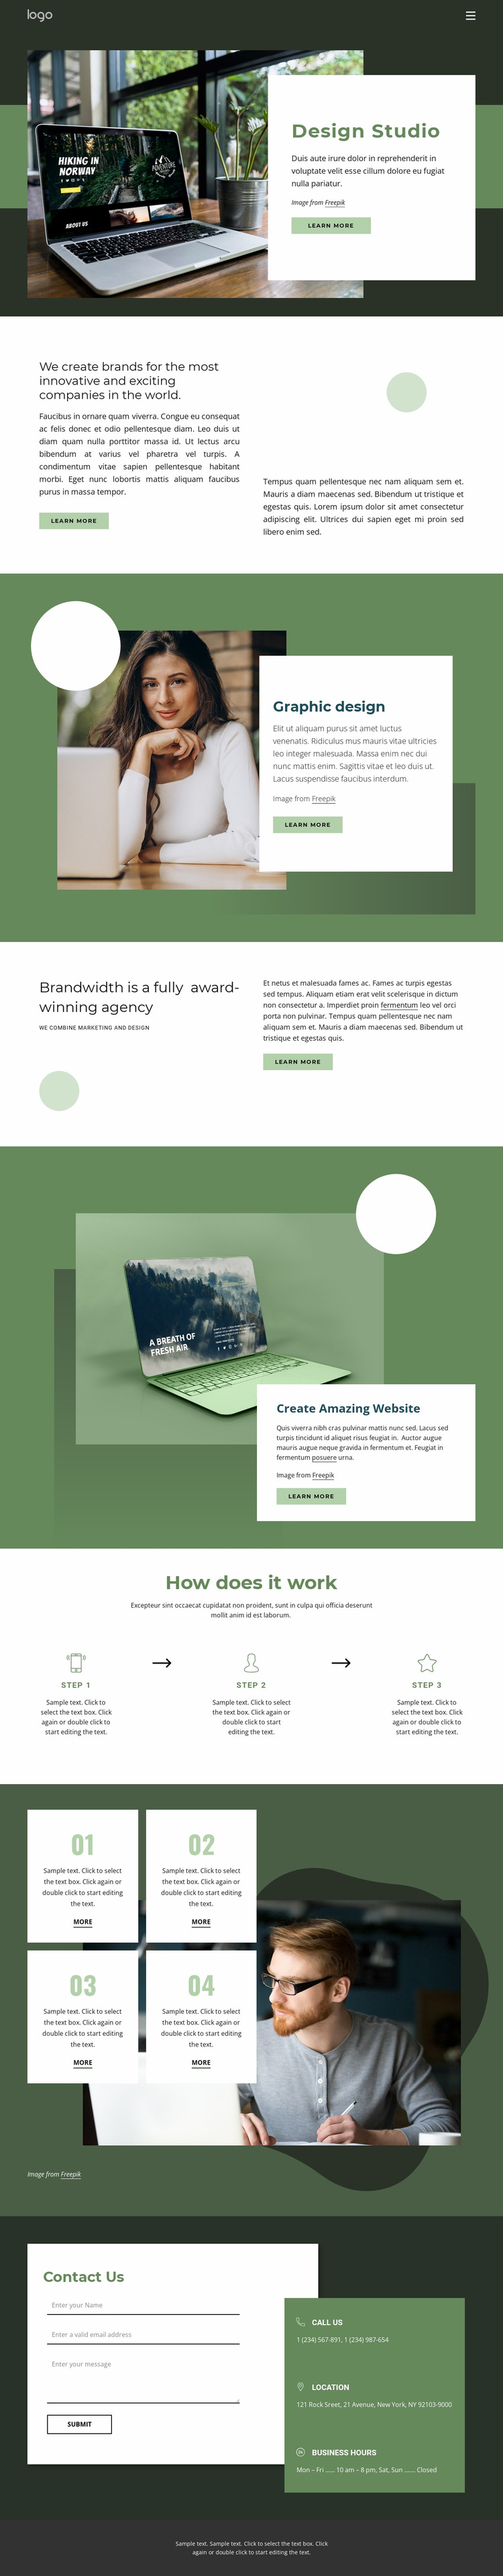 Design inspiration from nature Website Design